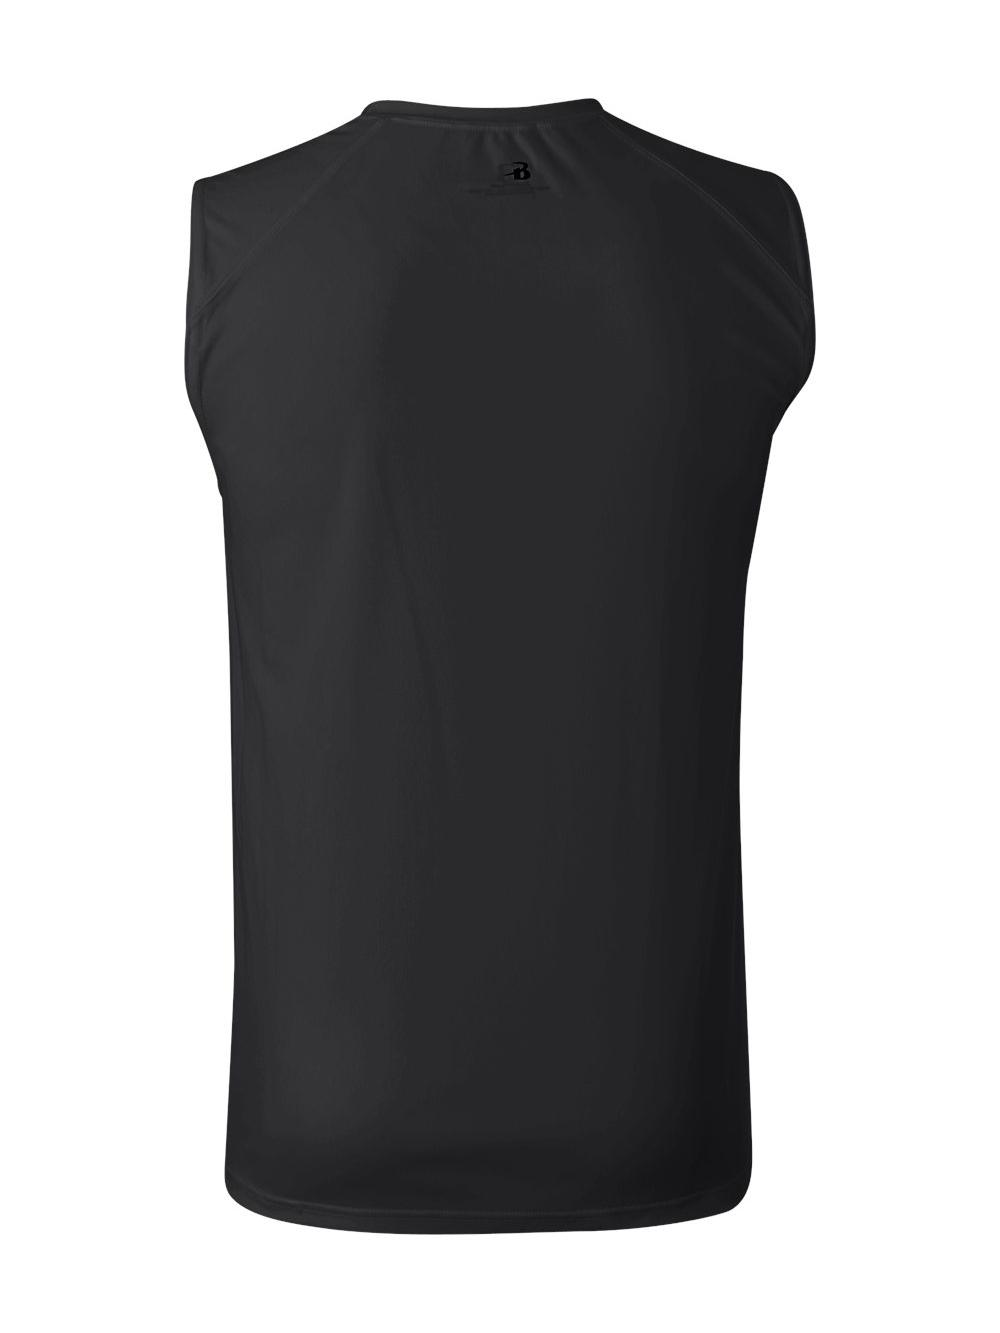 091a3fa640b8c Badger-B-Core-Sleeveless-T-Shirt-4130 thumbnail 4